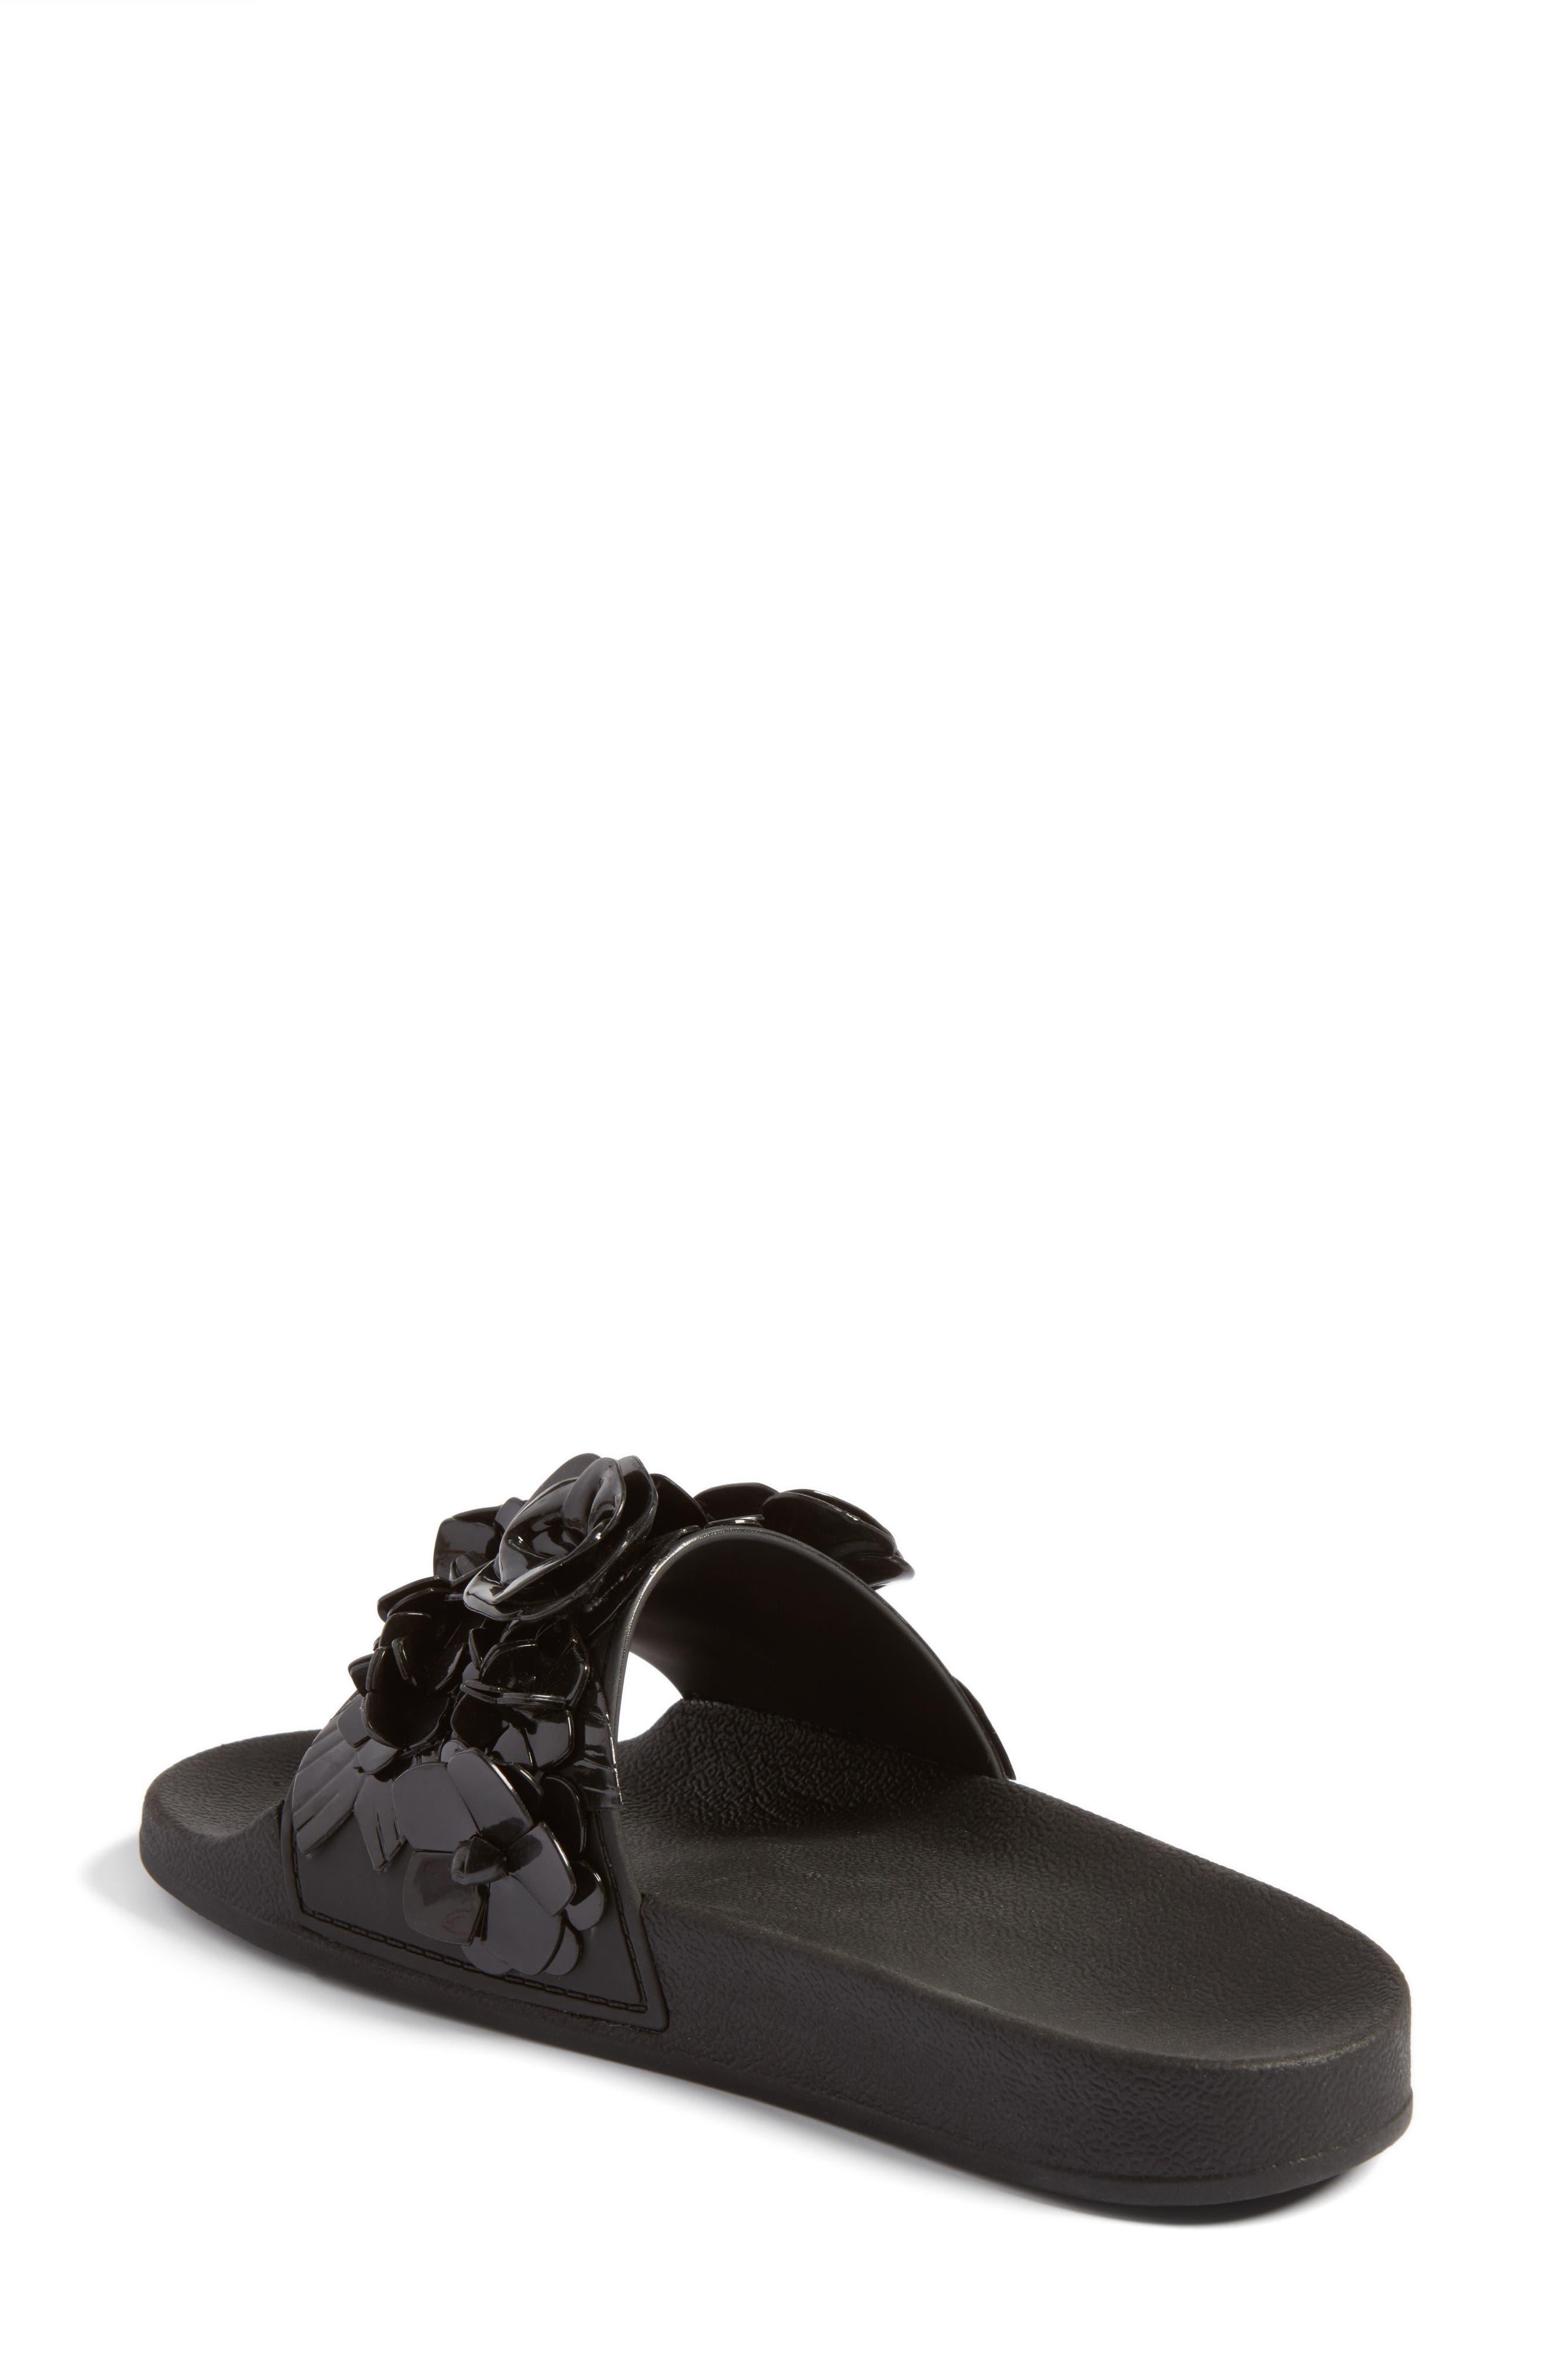 Black rainbow sandals with crystals - Black Rainbow Sandals With Crystals 9